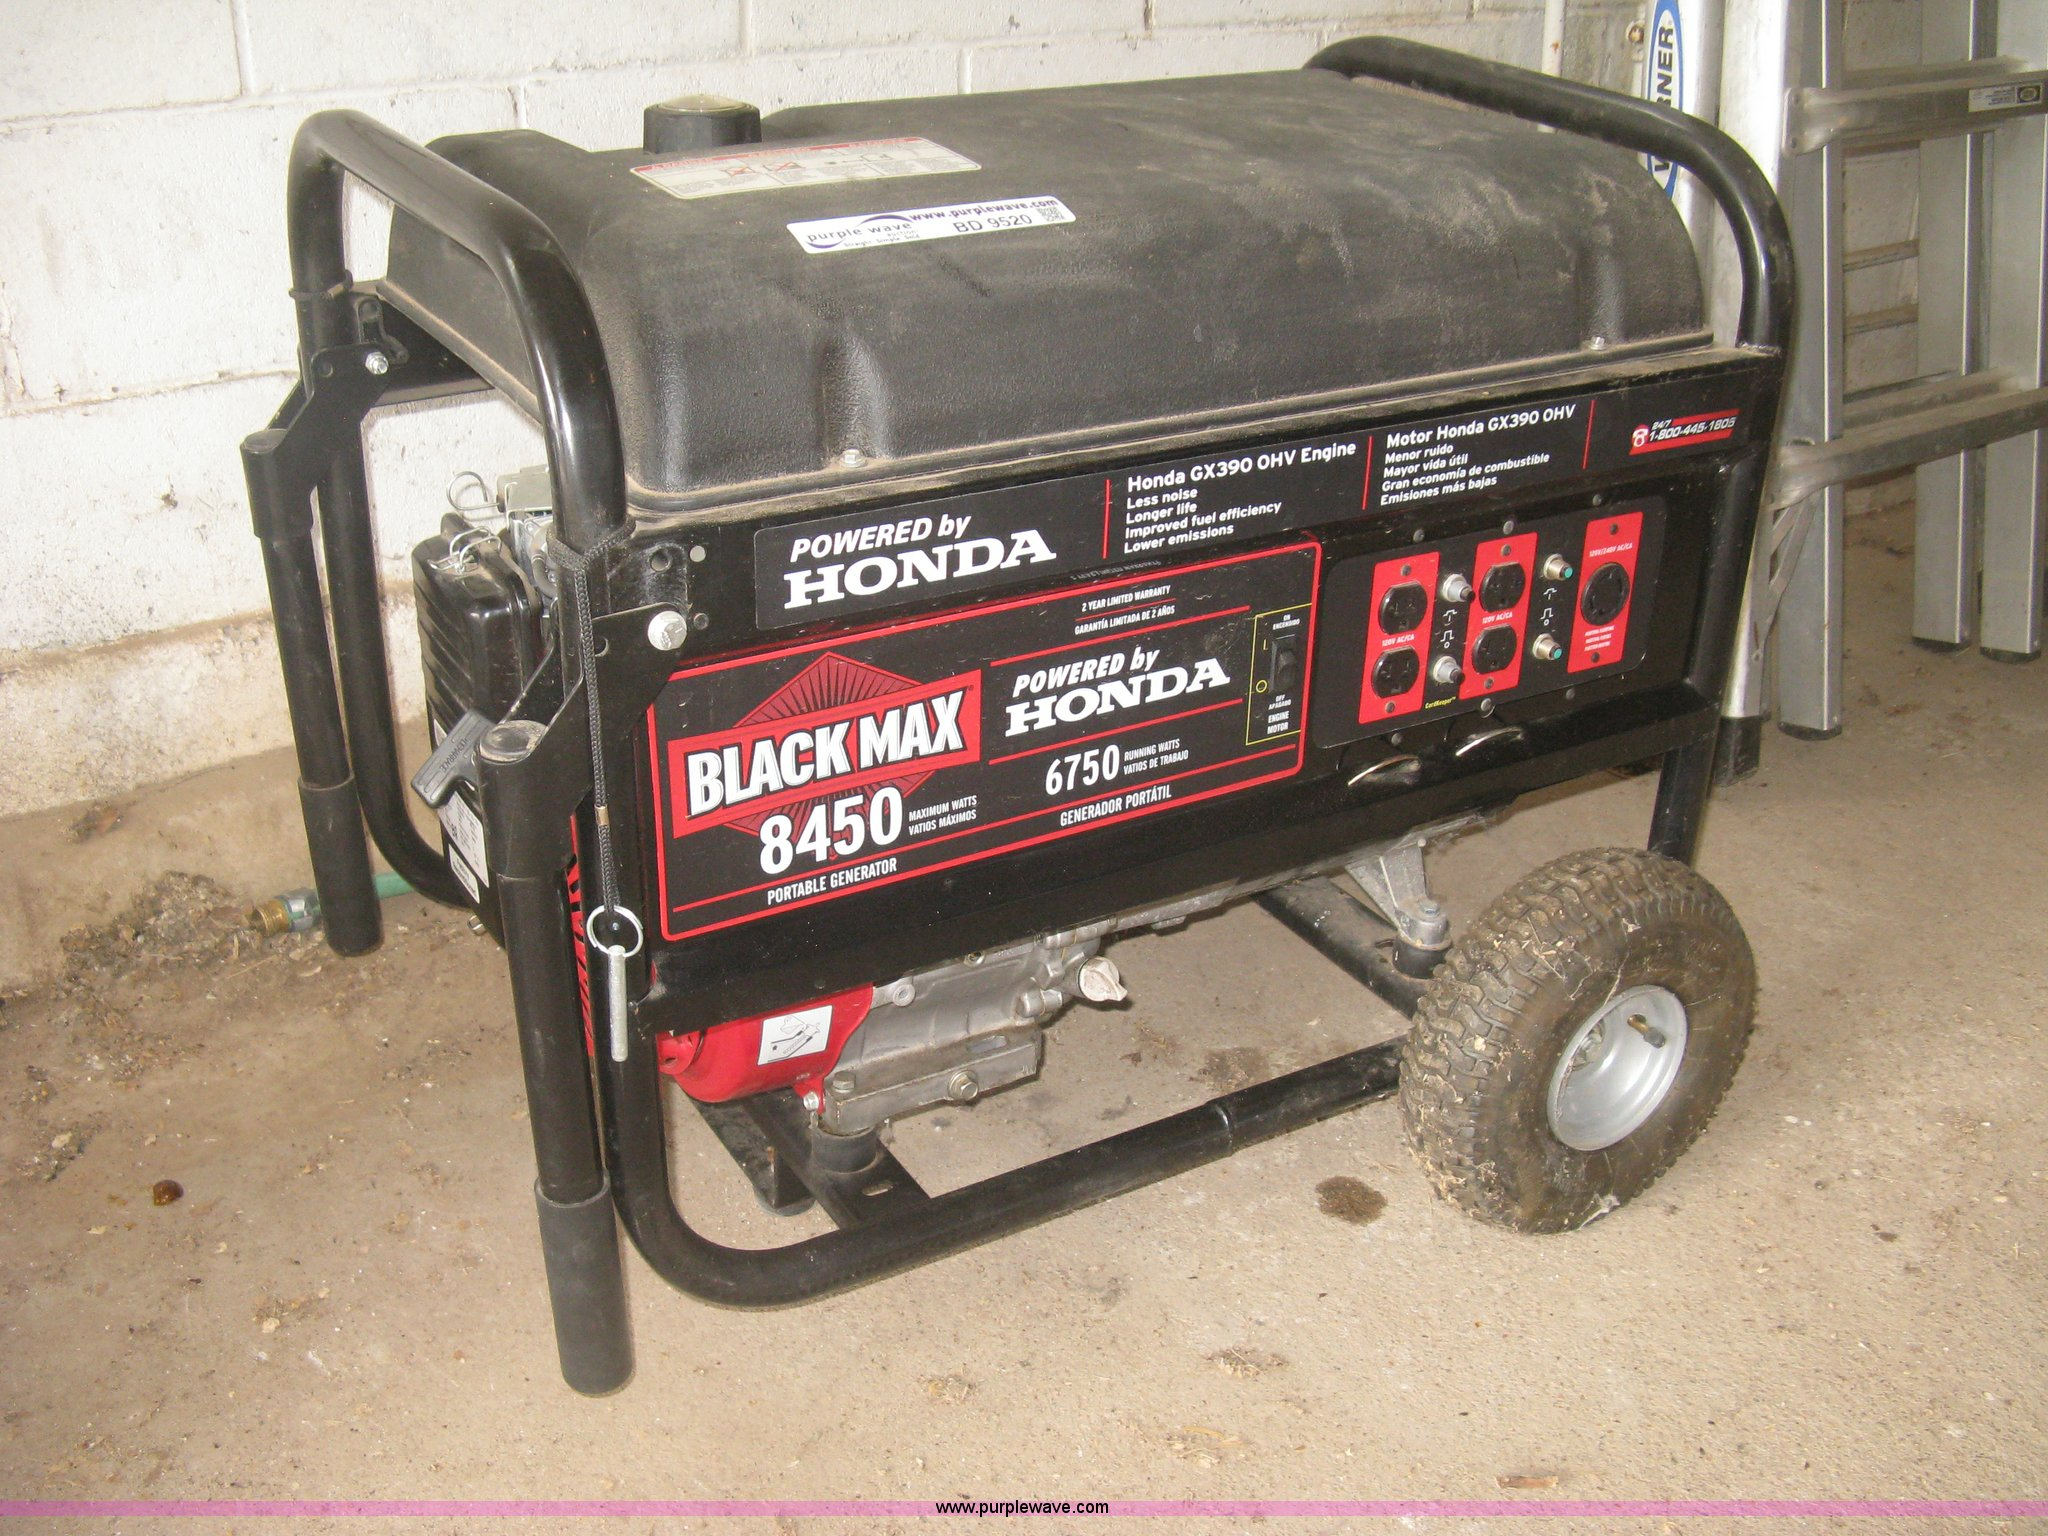 Black Max 8450 generator Item BD9520